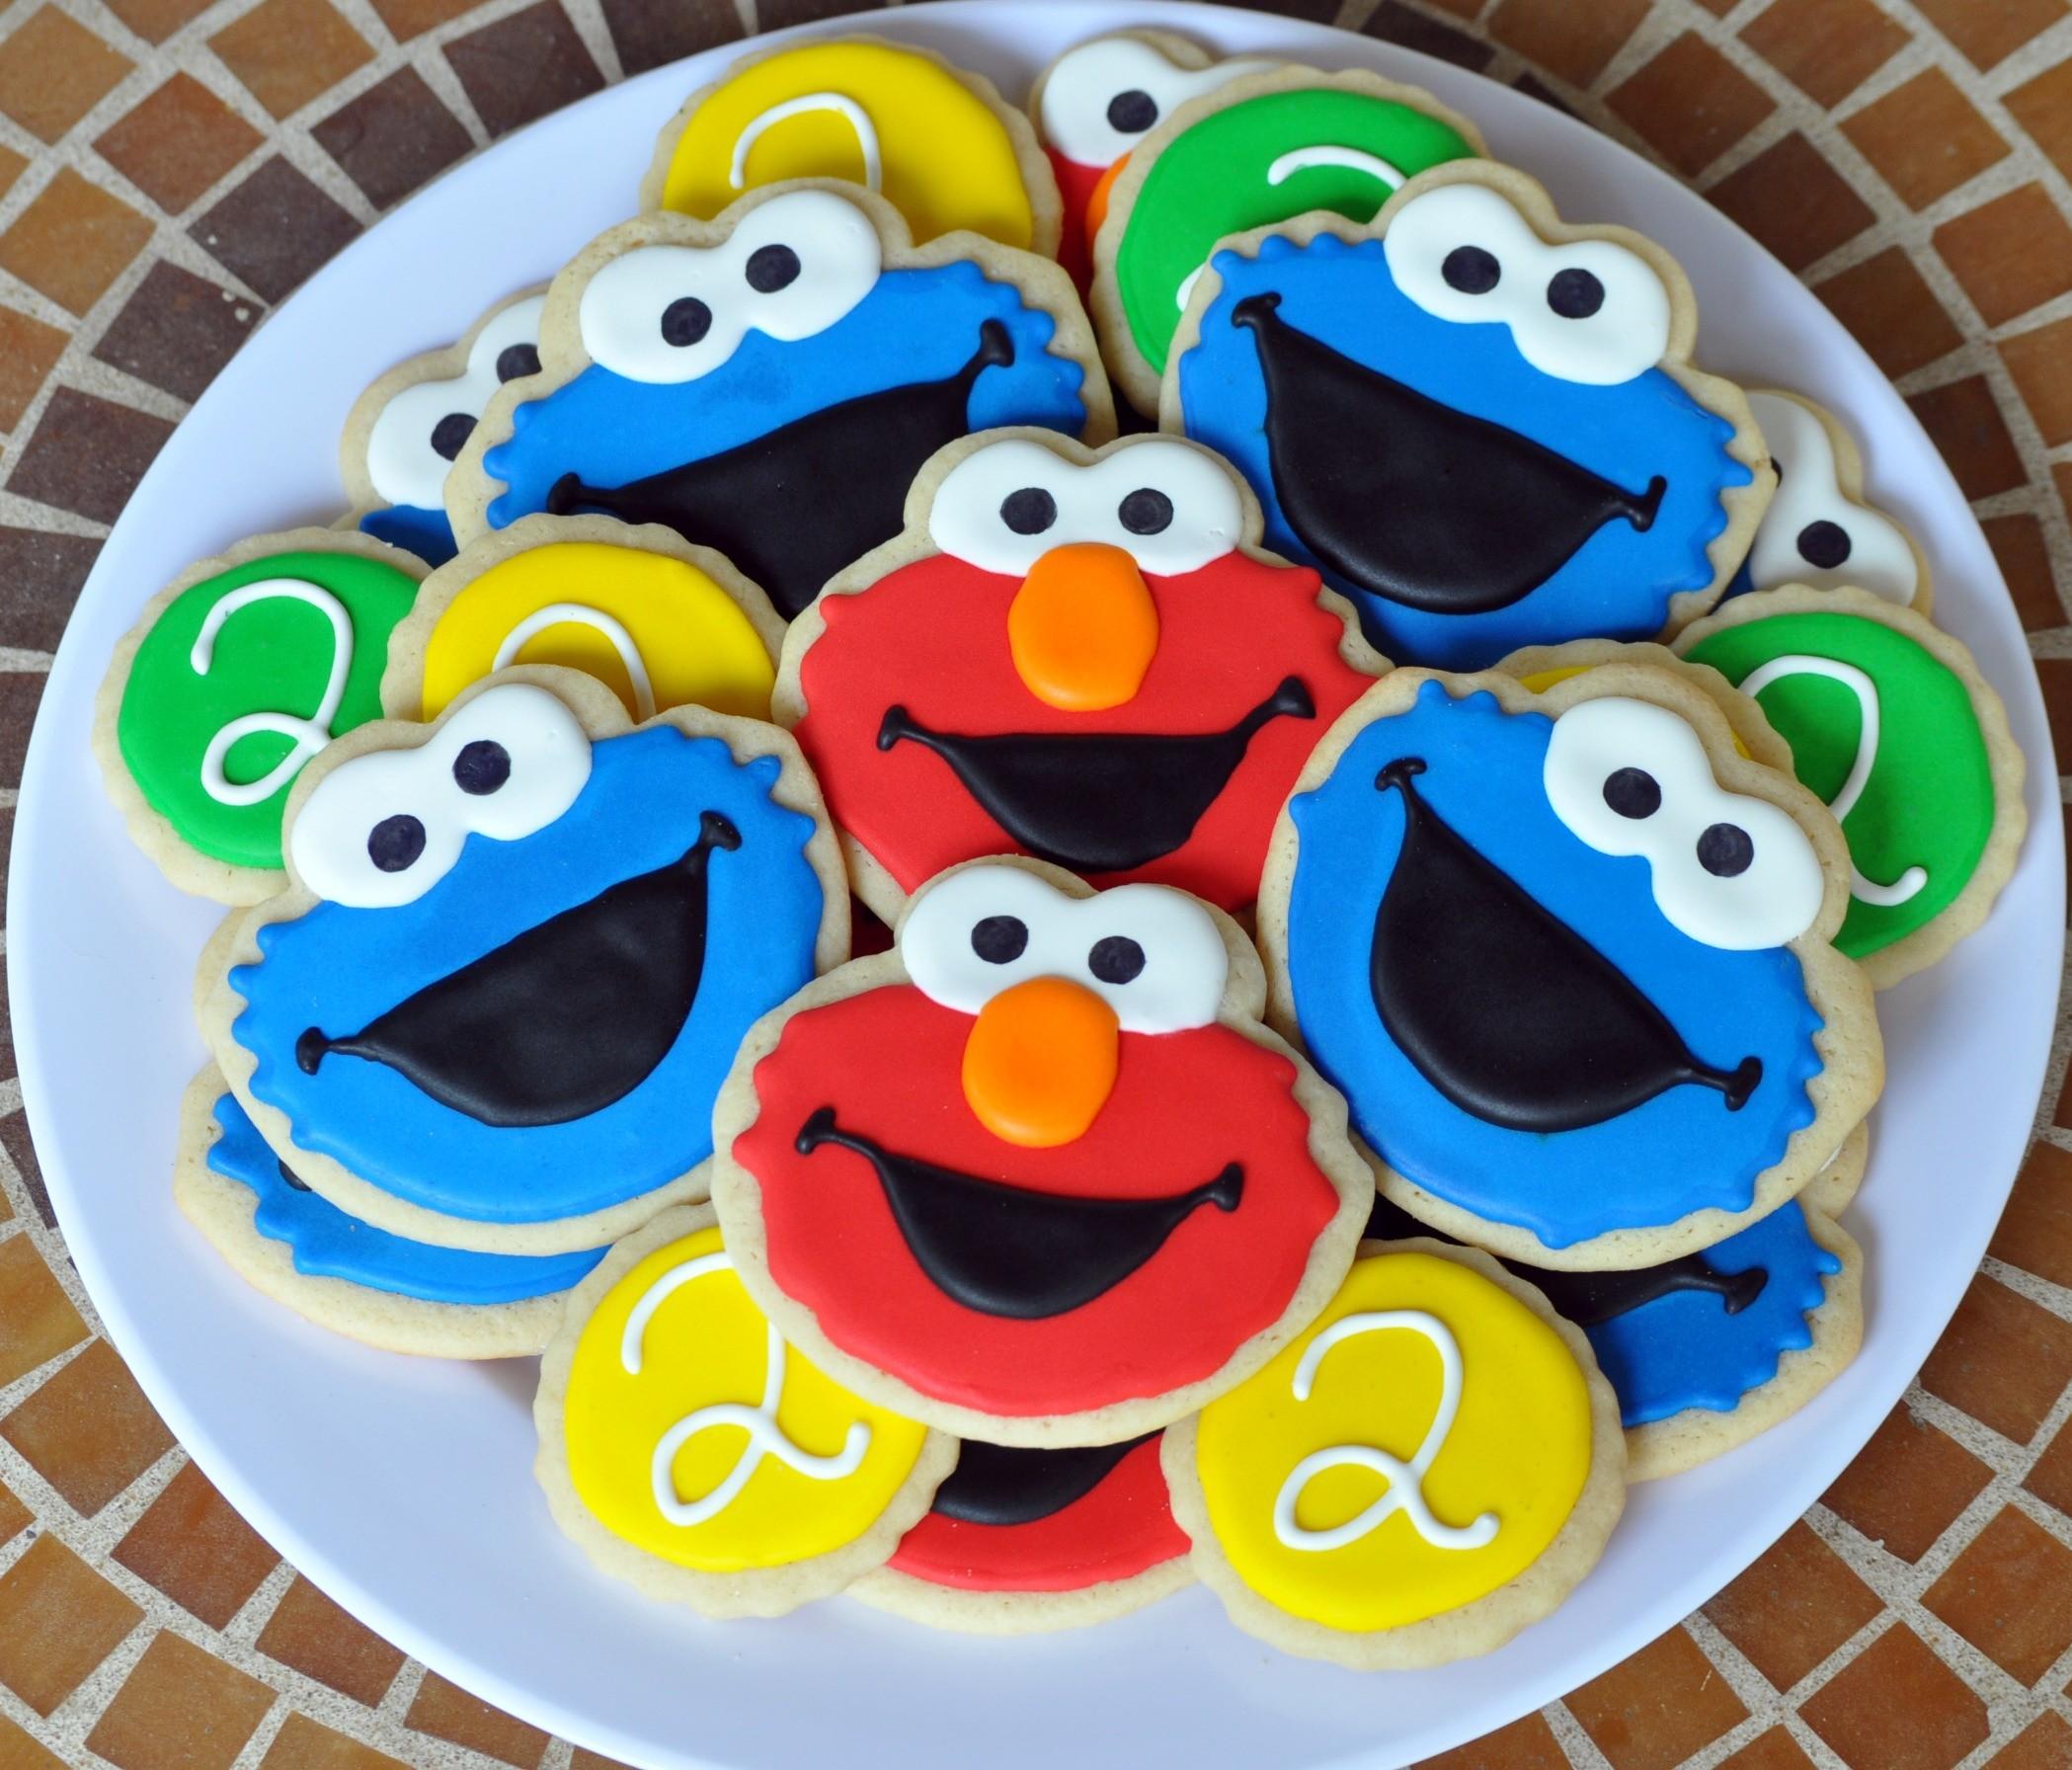 Res: 2098x1792, General 1920x1080 Cookie Monster cookies | sesame street | Pinterest |  Amazing art and Wallpaper